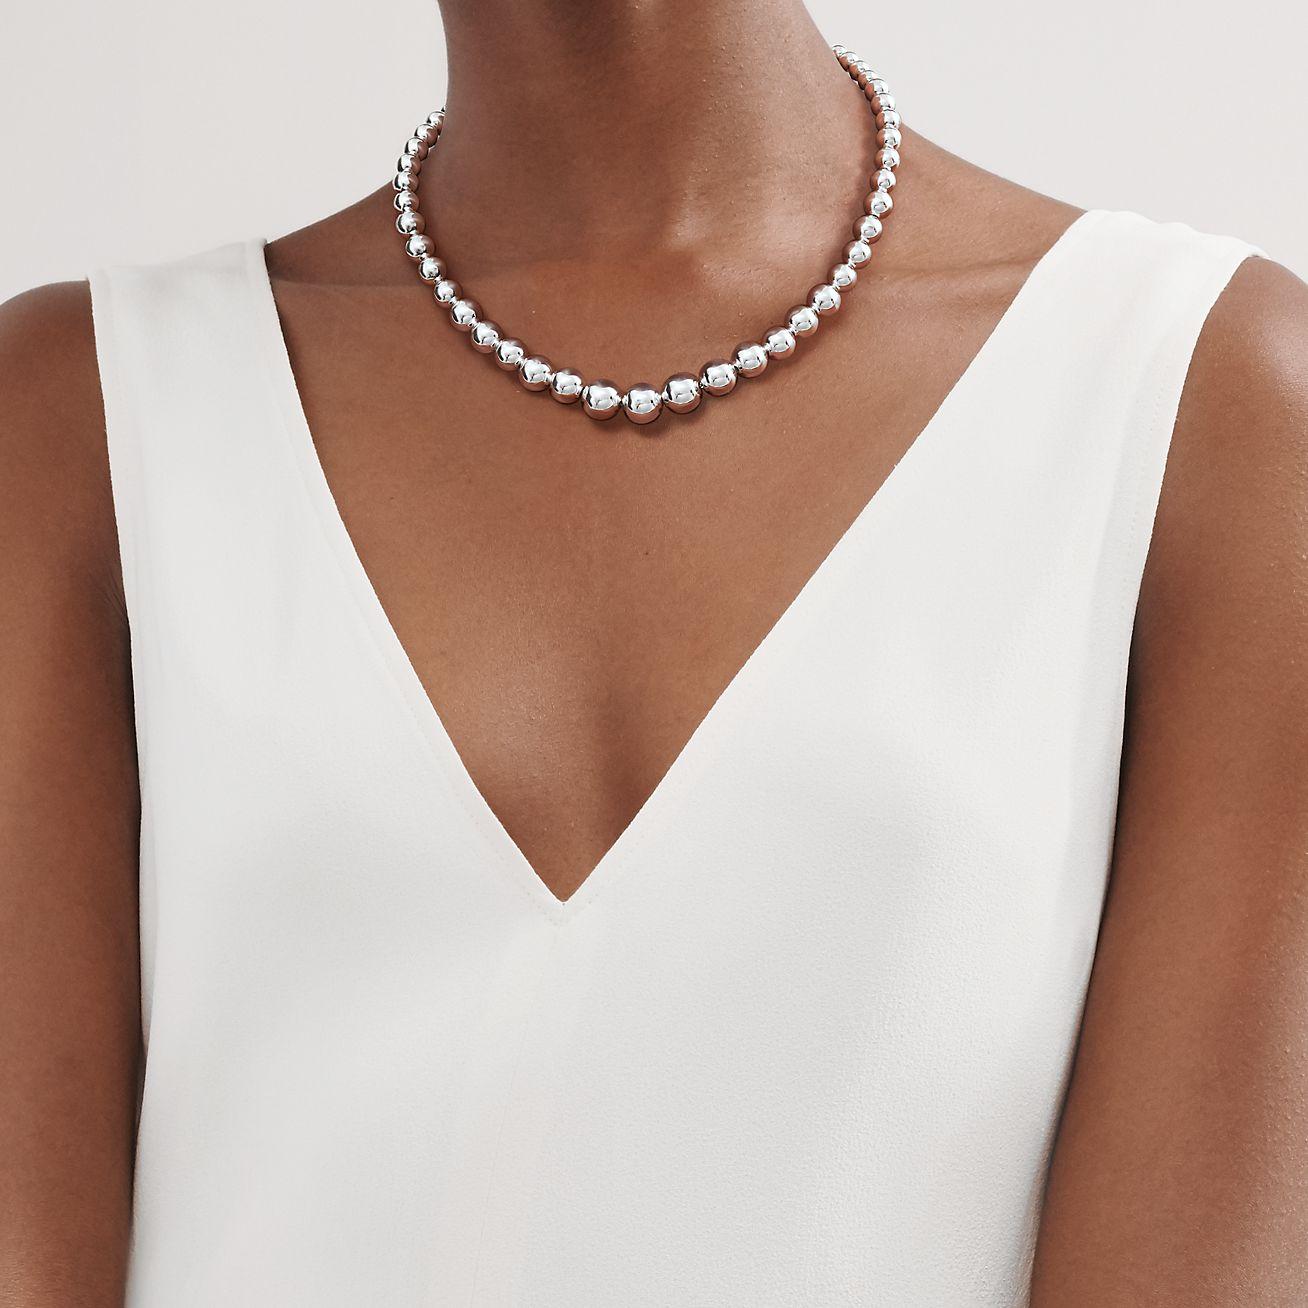 Tiffany Hardwear Graduated Ball Necklace In Sterling Silver Tiffany Co